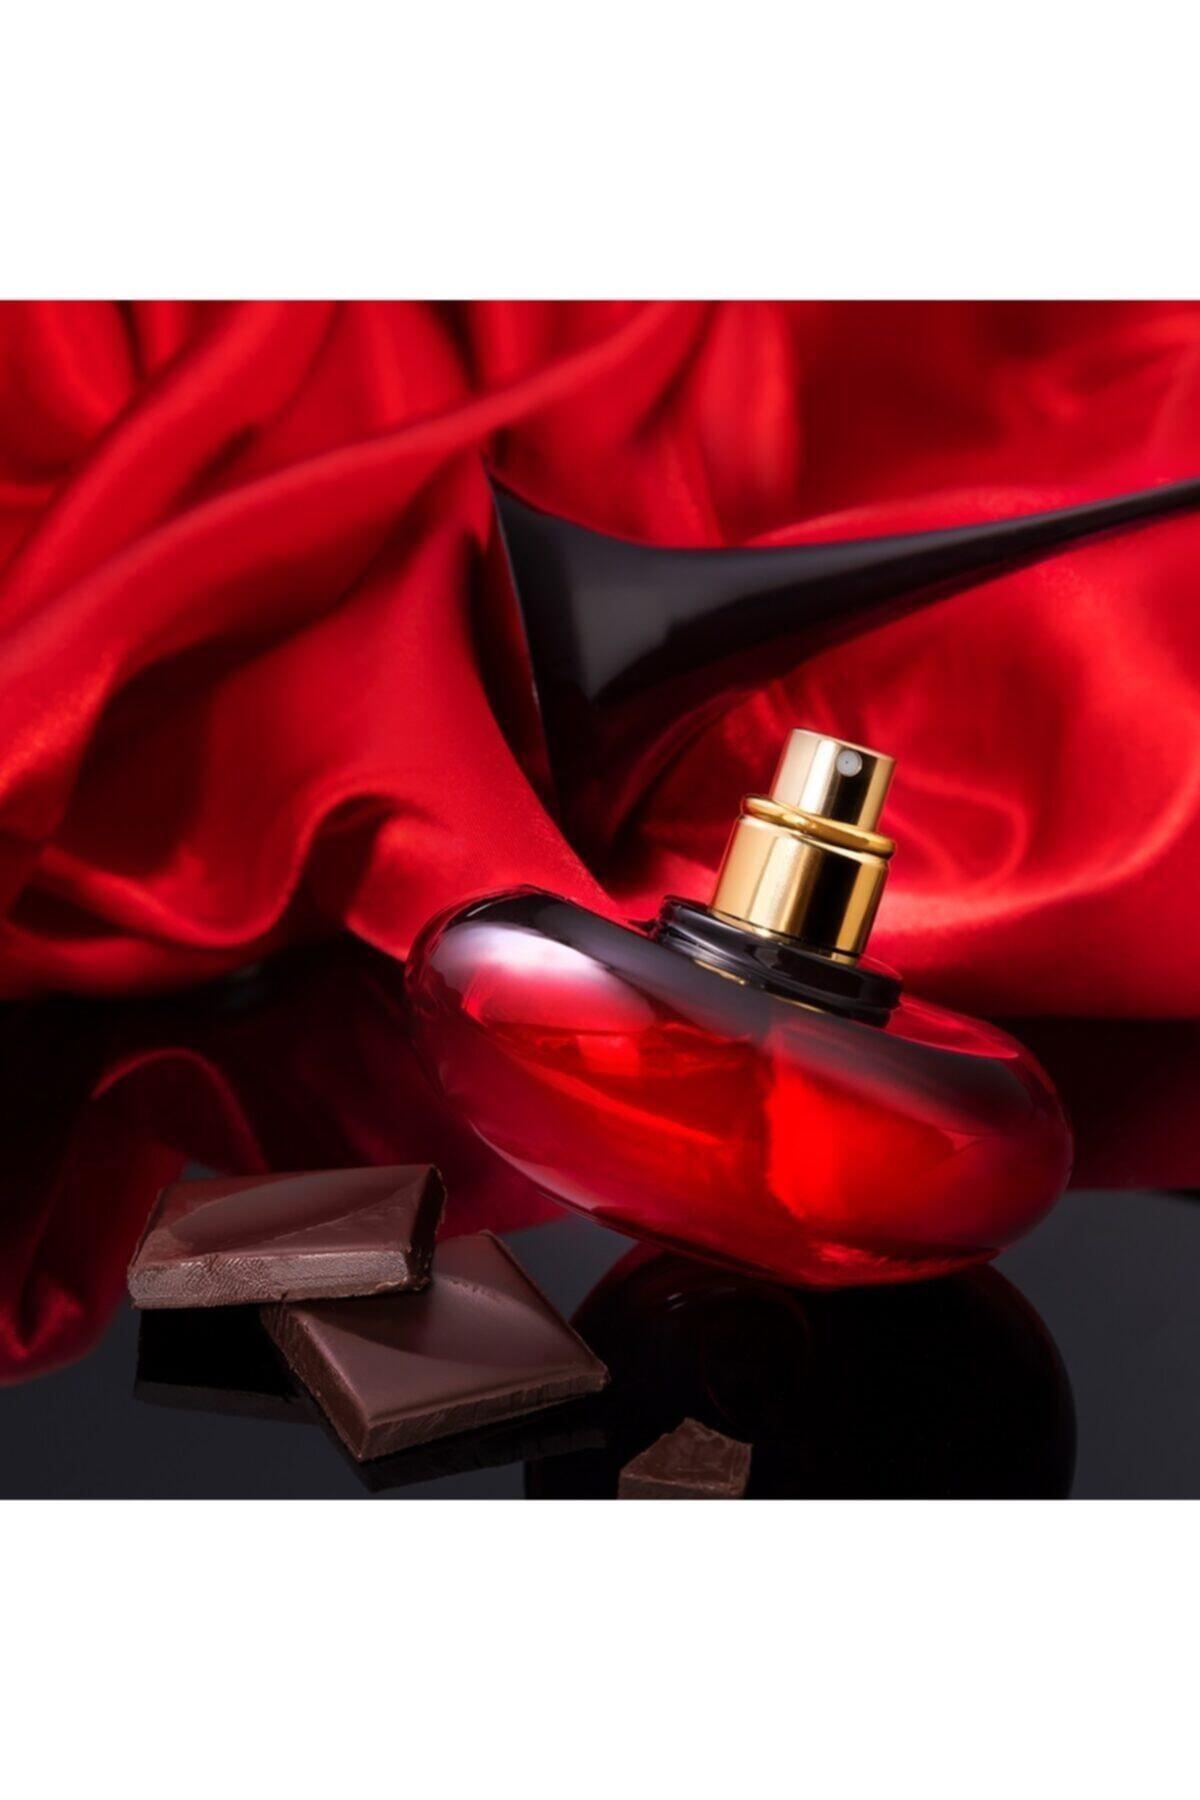 Oriflame Love Potion Edp 2